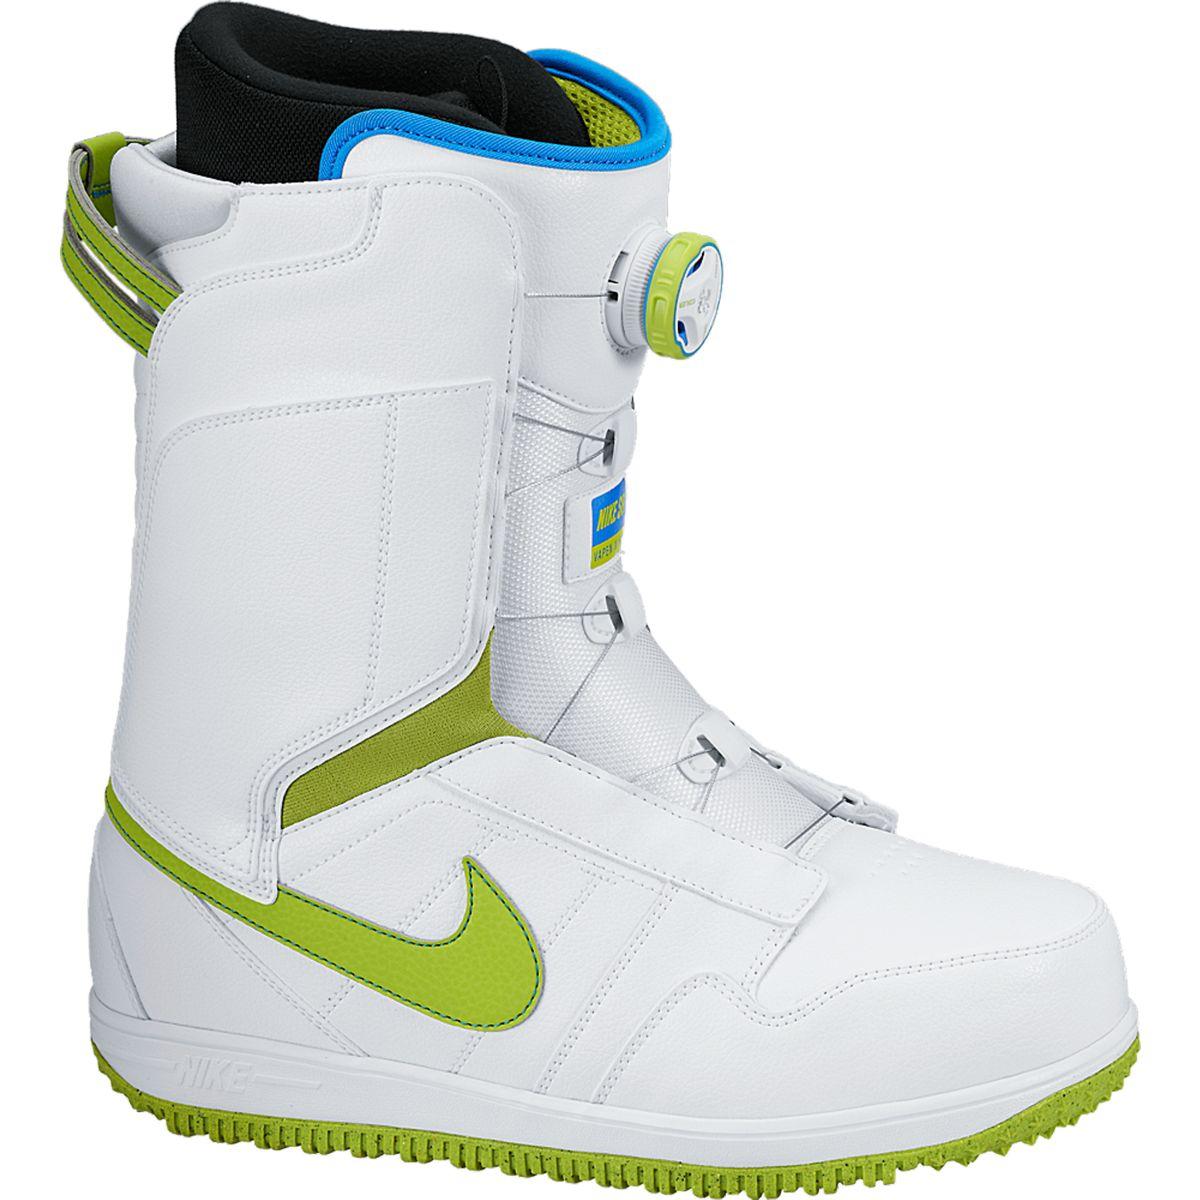 e84b074c Ботинки для сноуборда NIKE NIKE VAPEN X BOA FW15 купить в Москве,  Санкт-Петербурге. Ботинки для сноуборда NIKE NIKE VAPEN X BOA FW15 цена,  отзывы, ...